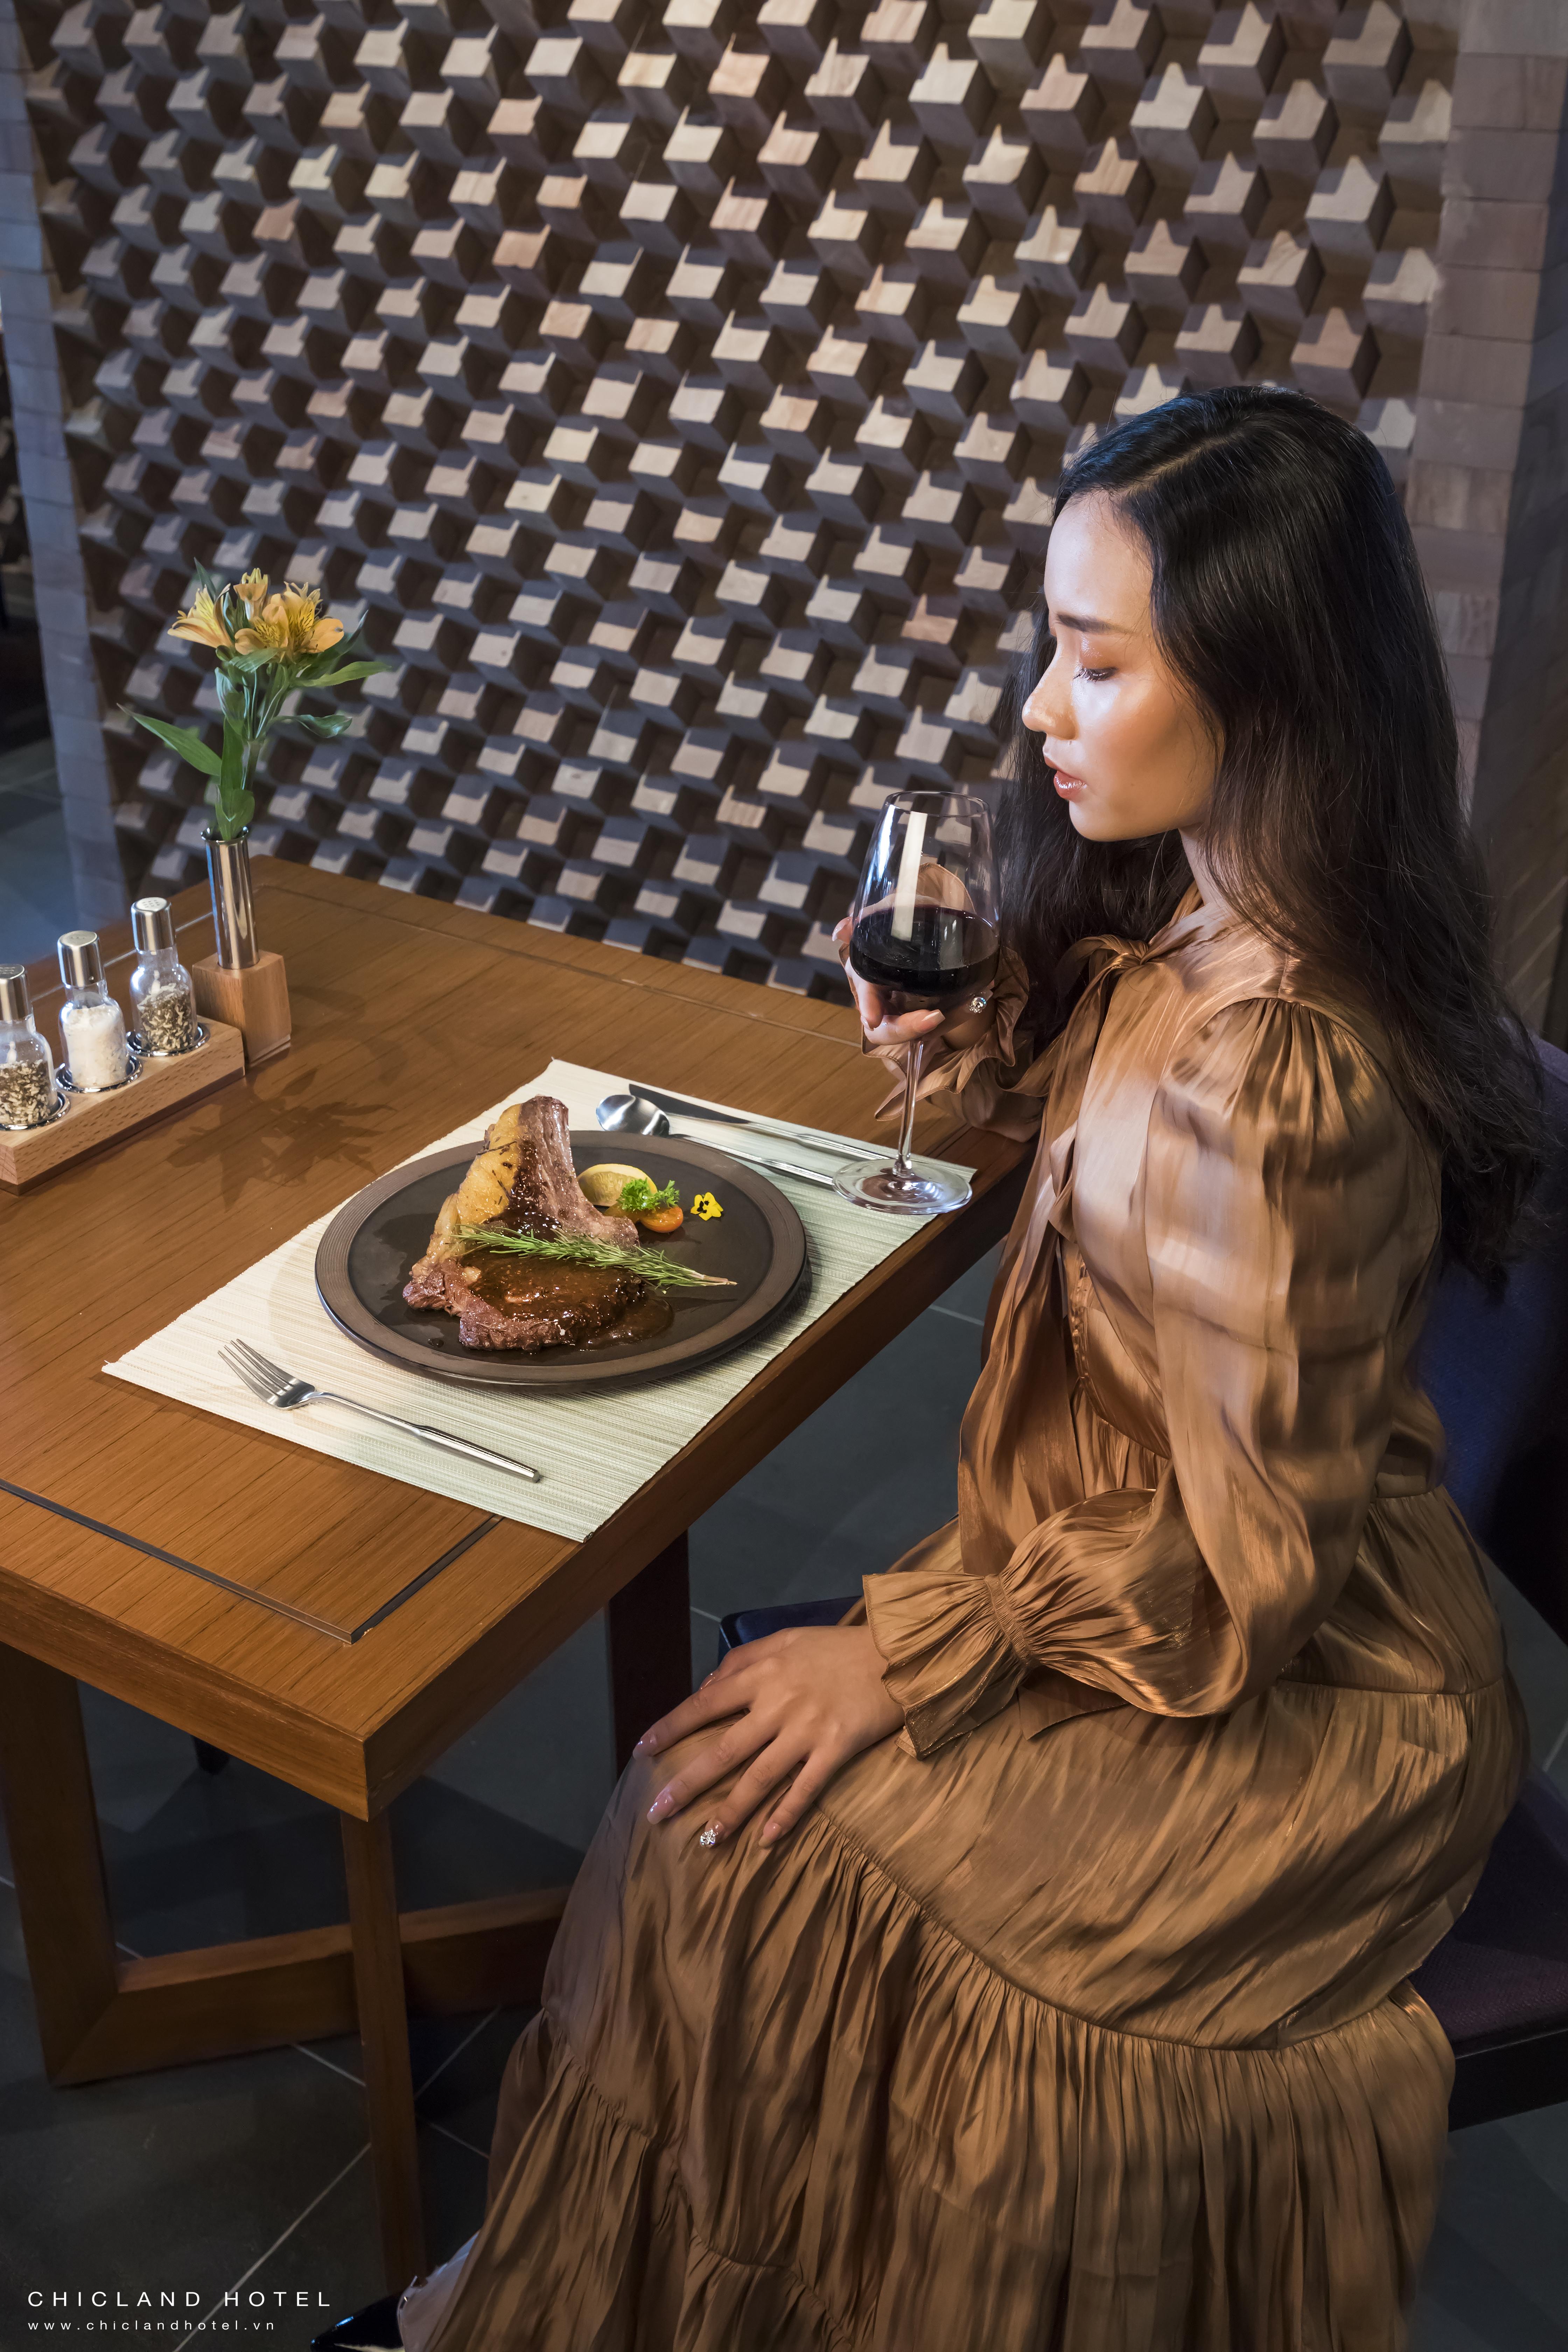 Chef at Lá Hẹ restaurant | CHICLAND Hotel